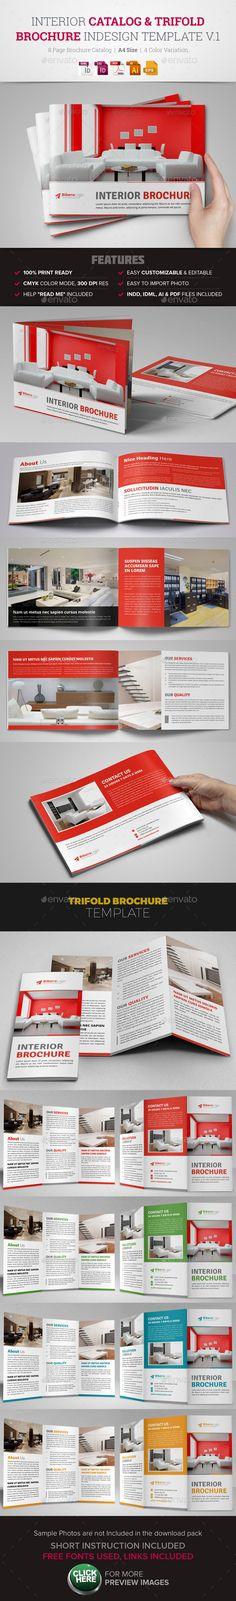 Interior Design Catalog Trifold Brochure